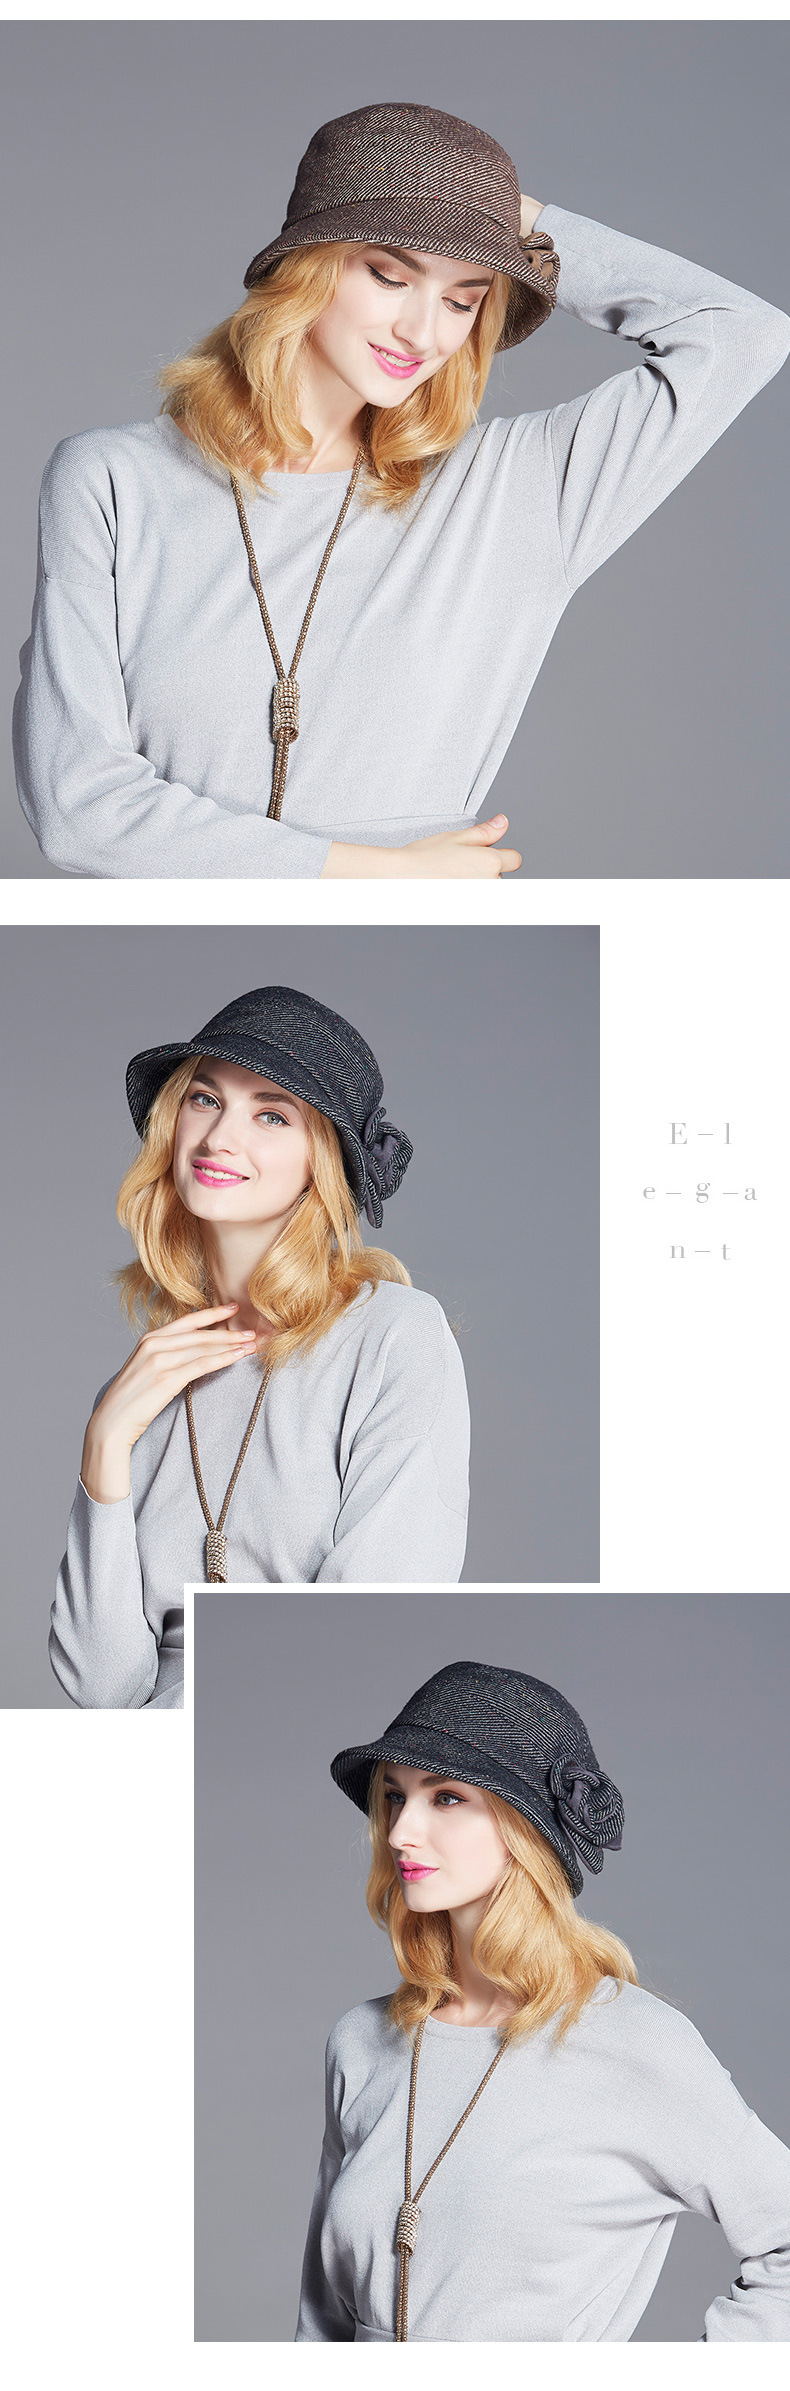 Item 2018 New Women European American Style Rose Flower Color Collision  Bucket Hats Female Elegant Fashion Dome Small Fedoras Hats d1b3376f6b75